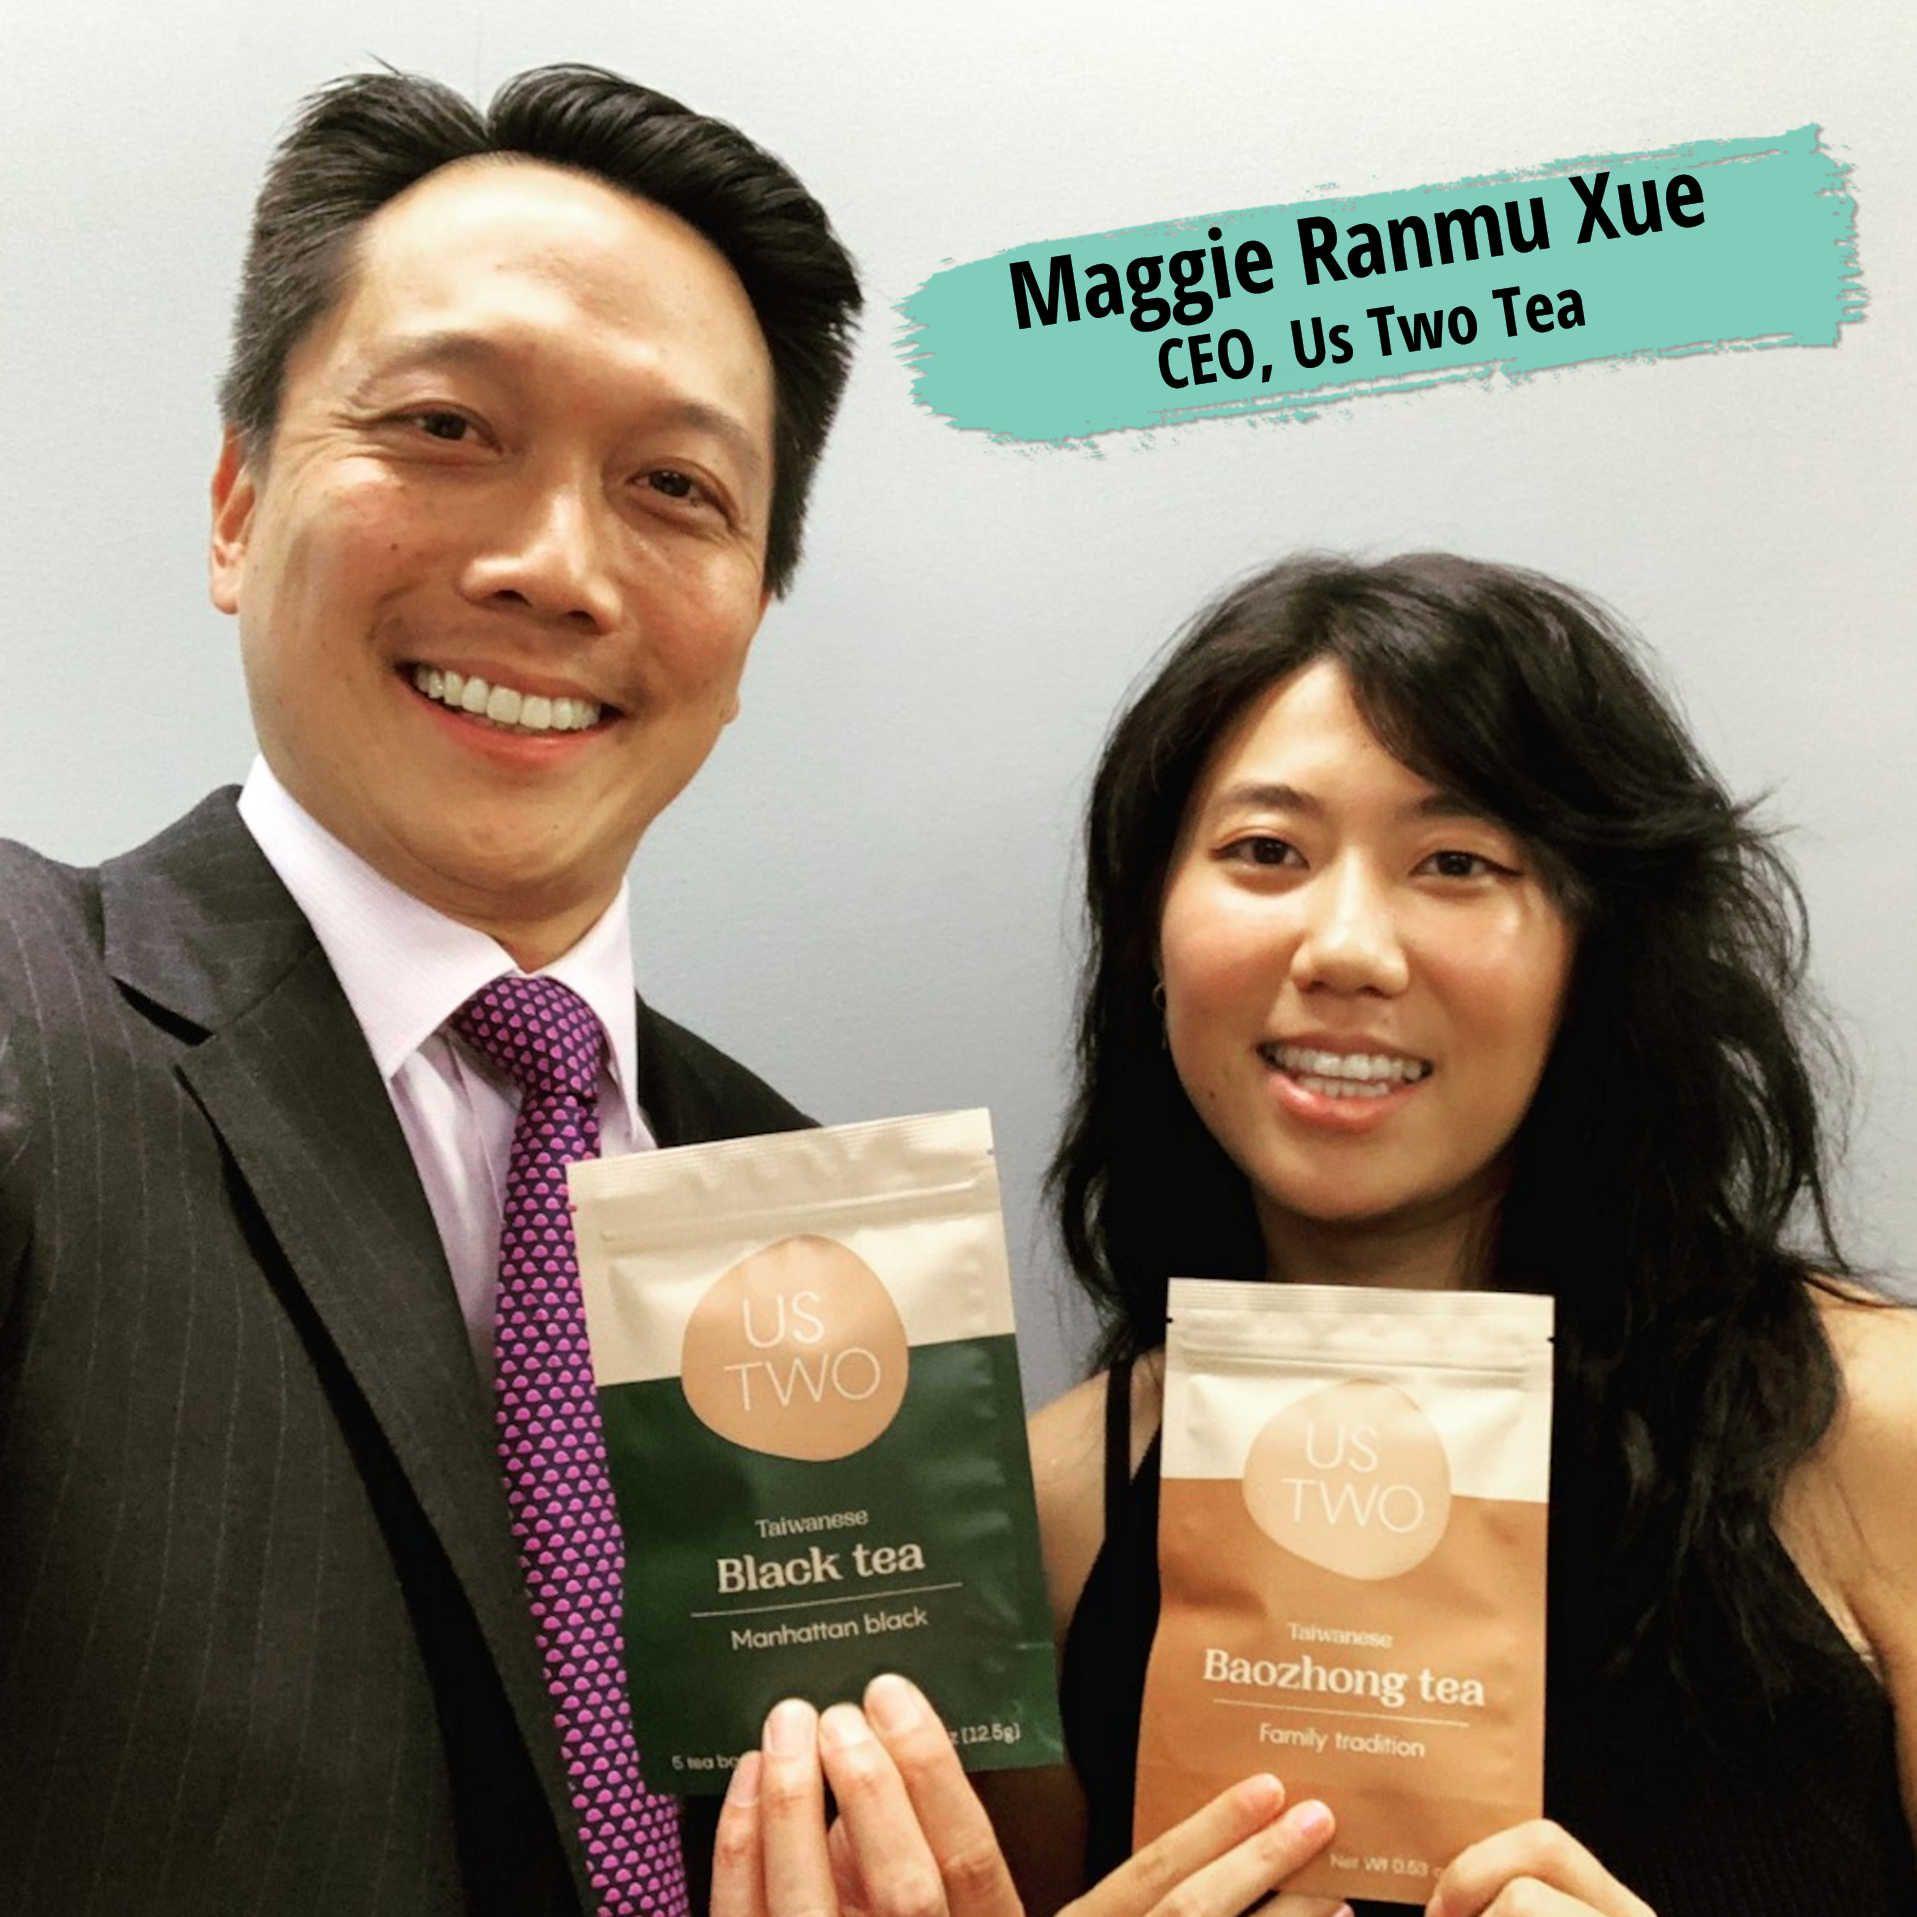 Maggie Ranmu Xue